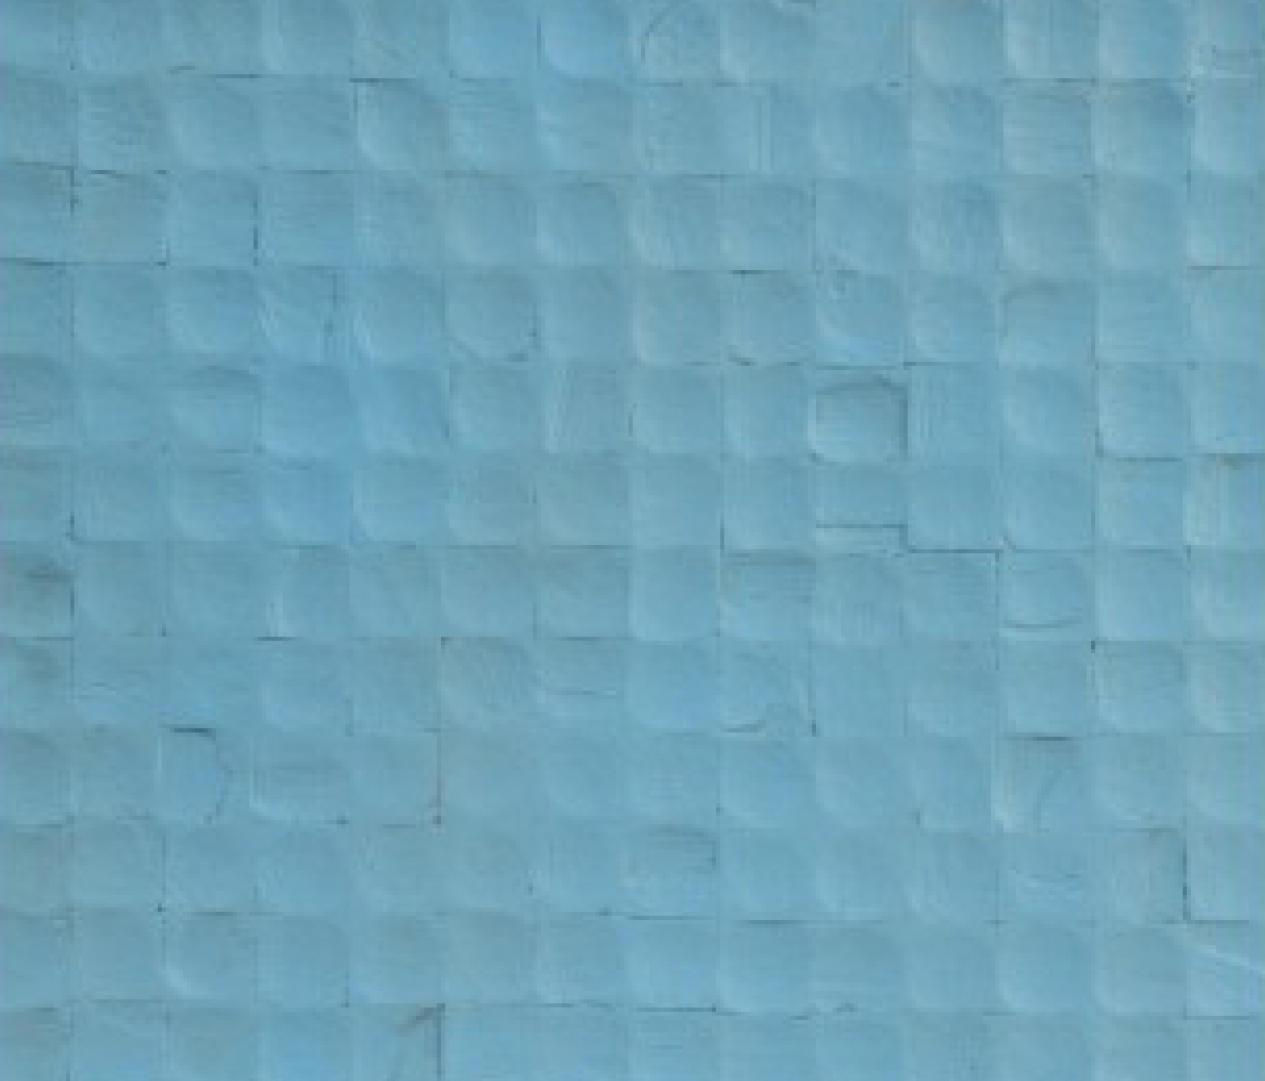 COCOMOSAIC TILES FANCY BLUE - Coconut mosaics from Cocomosaic ...